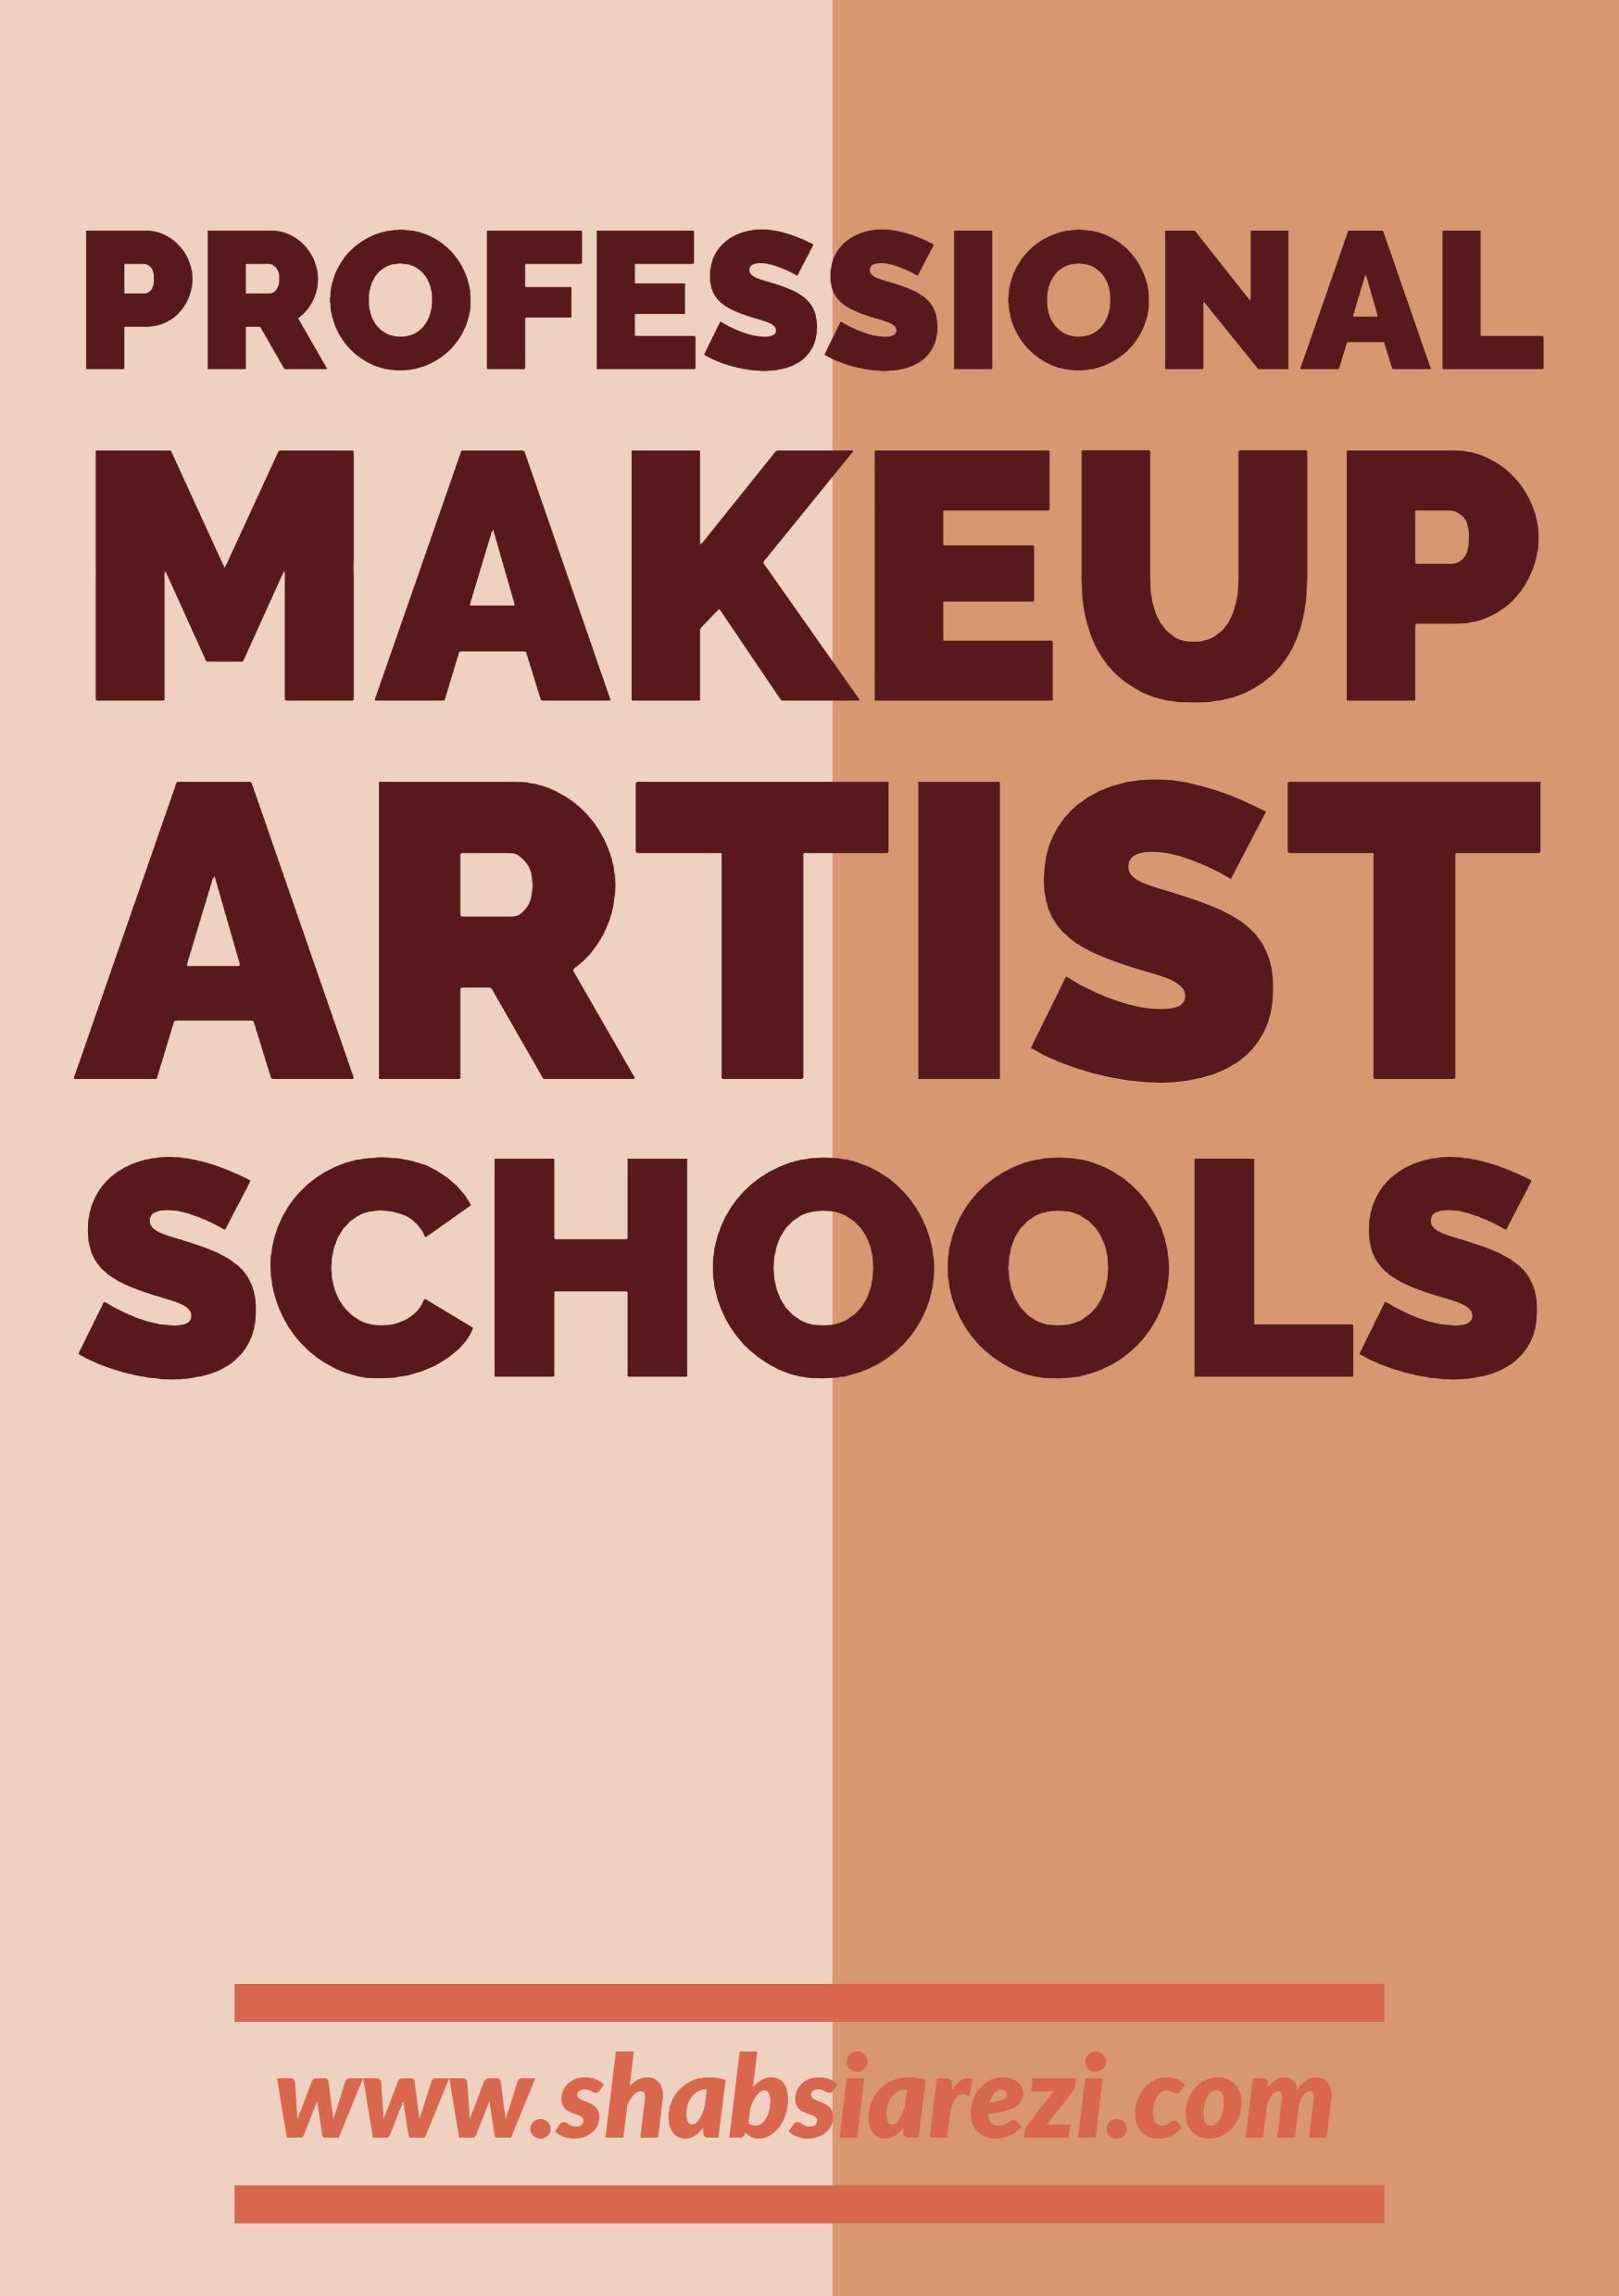 Professional makeup artist schools Makeup artist schools